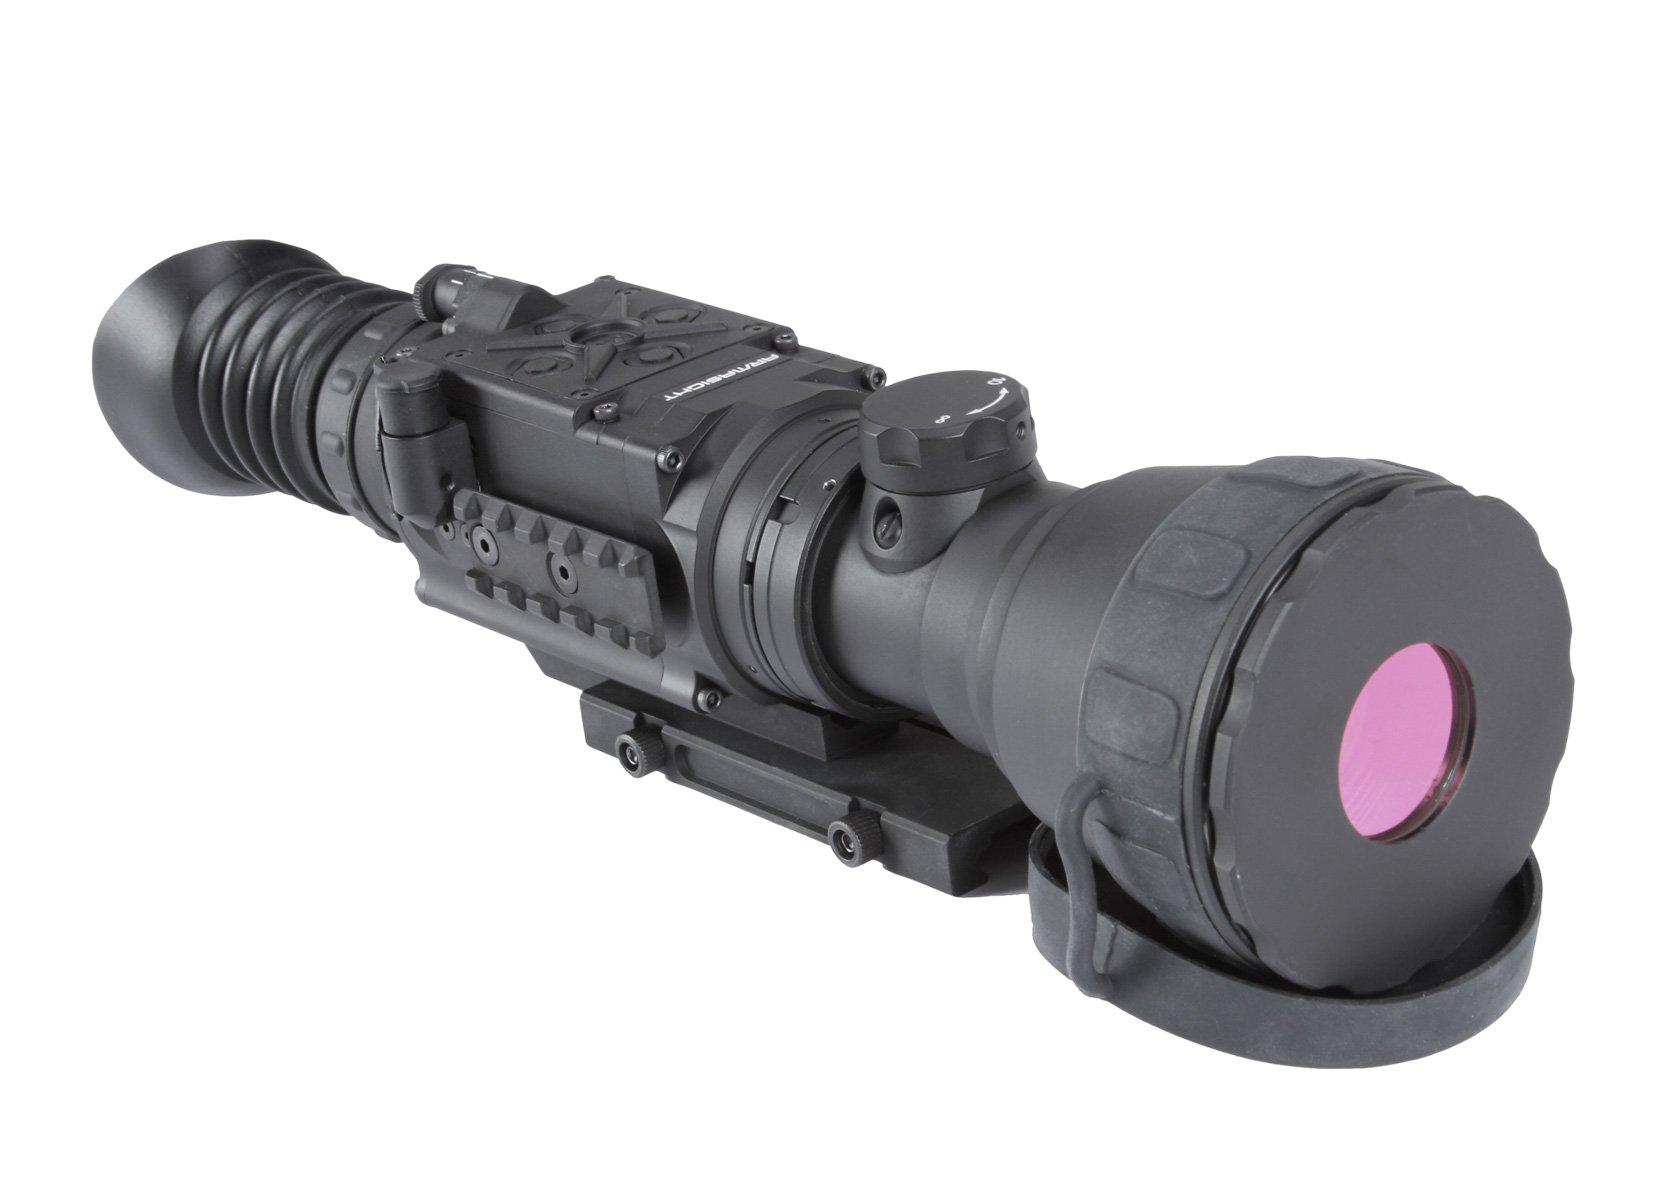 Armasight Drone Pro 10X Digital Night Vision Rifle Scope Resolution 752x582 by Armasight